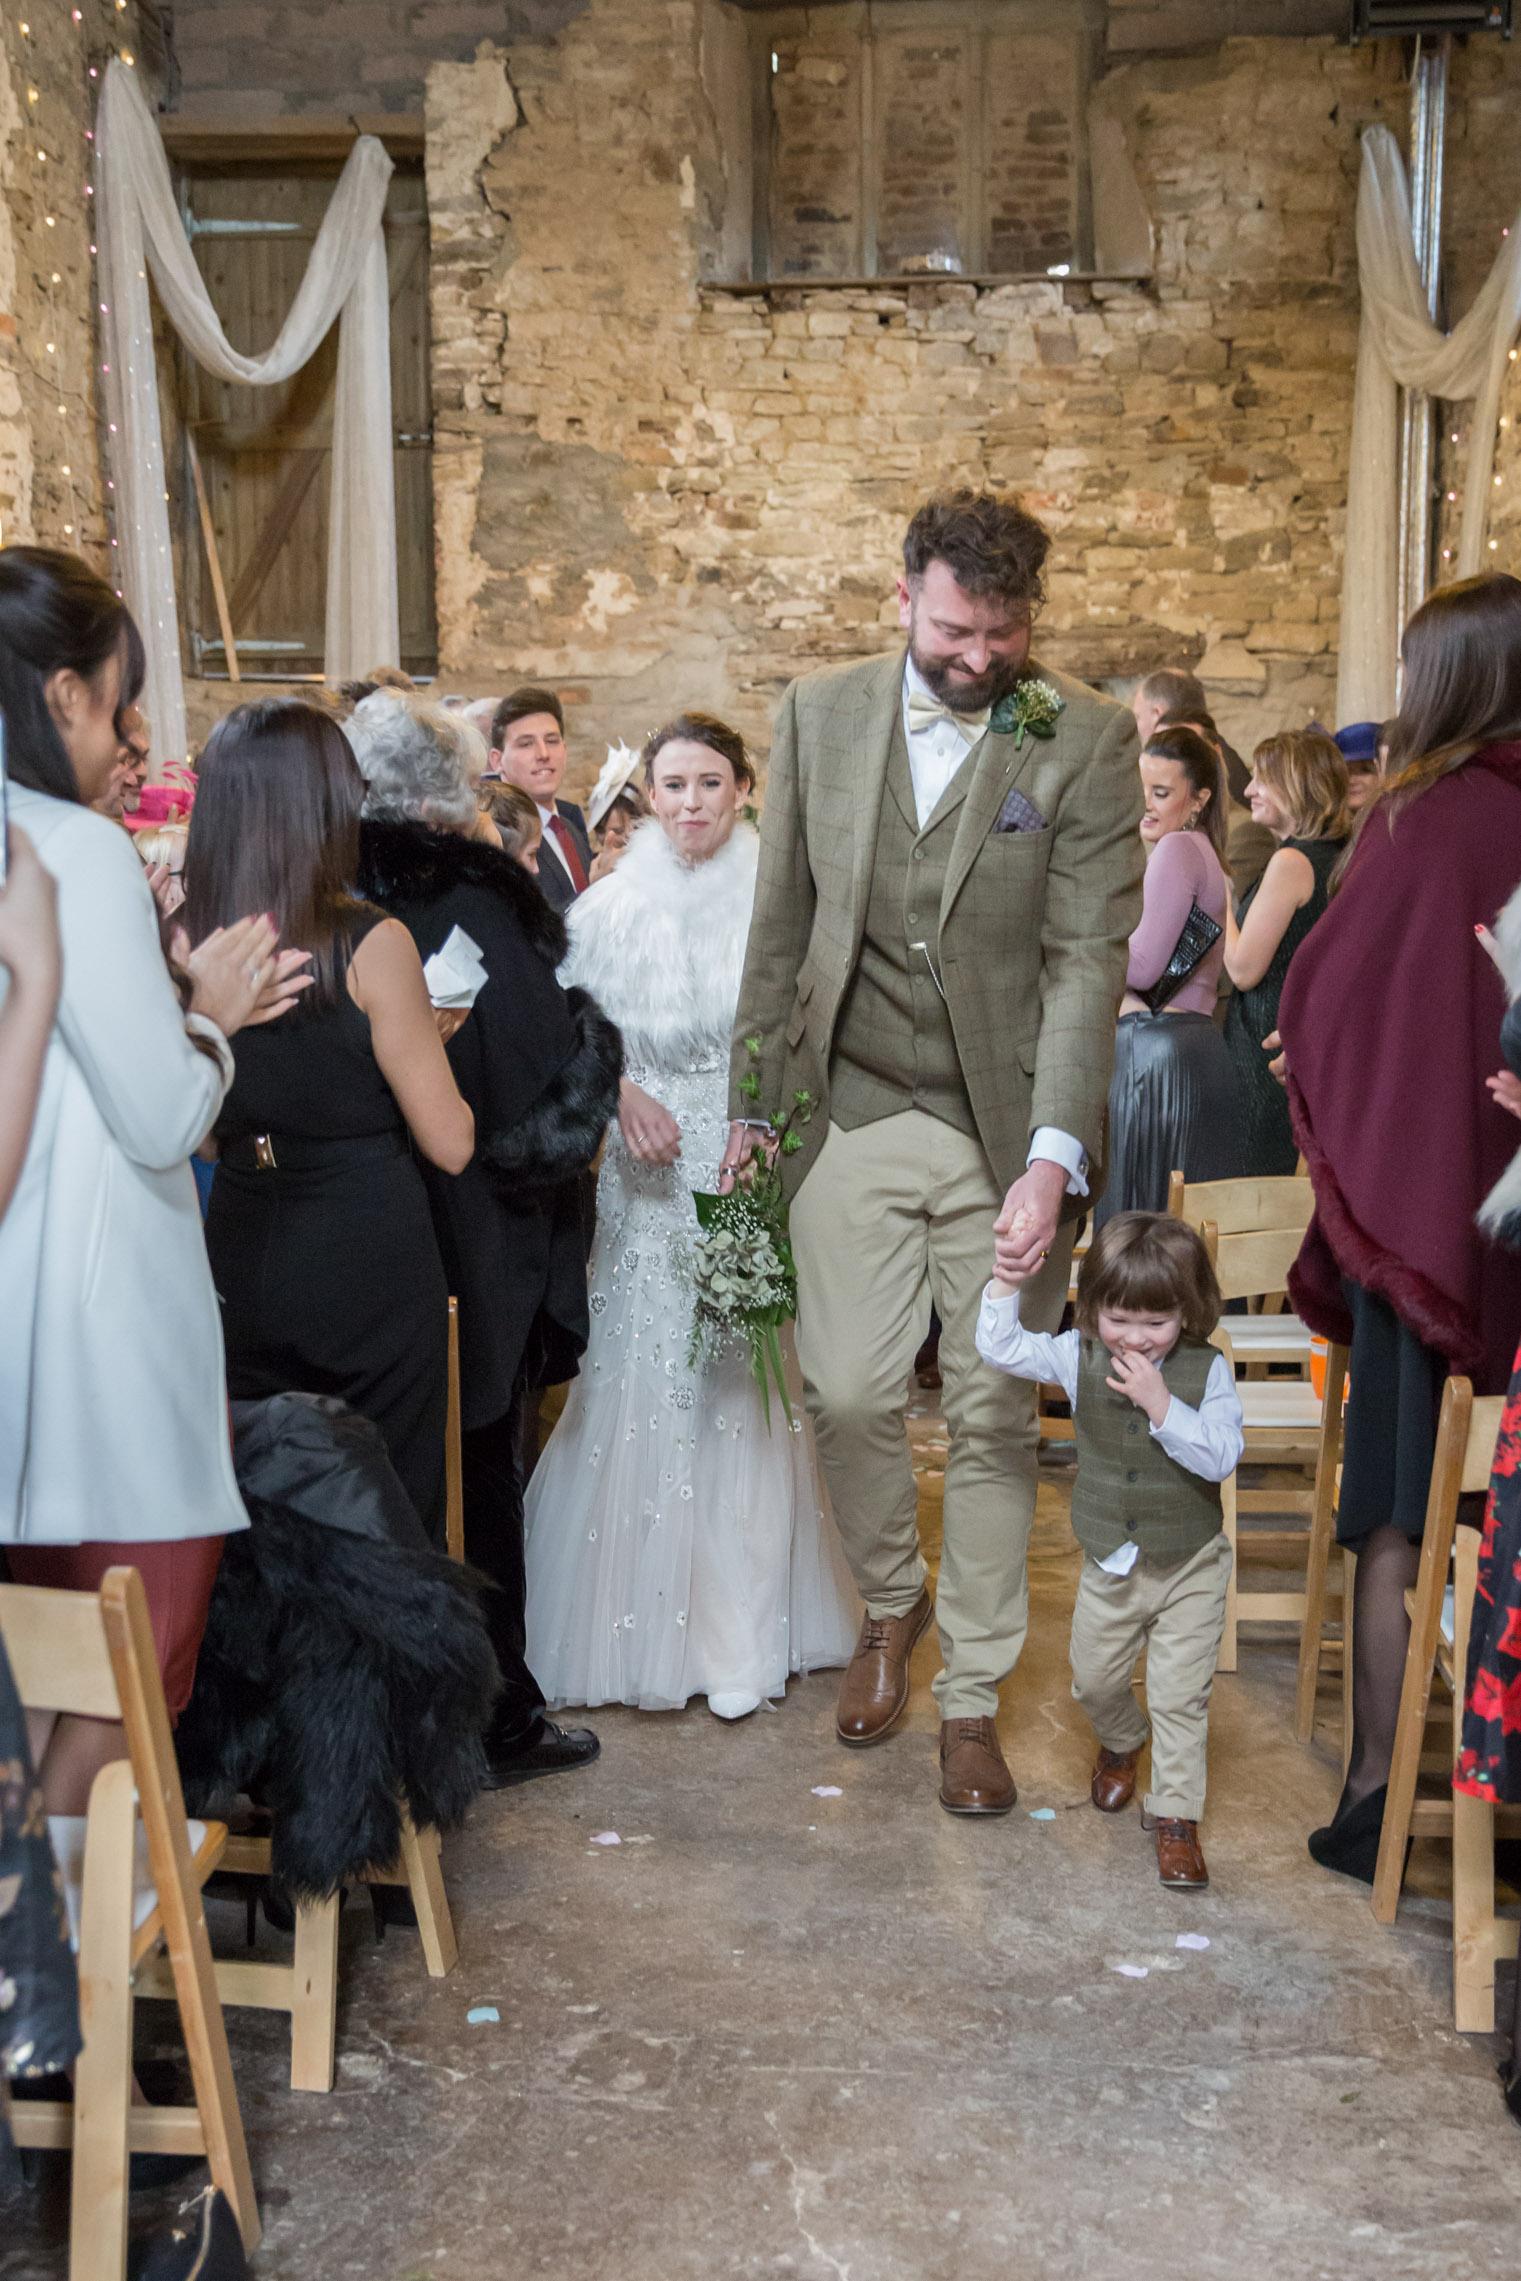 Jess & Ben - Bristol Wedding Photographer - Wright Wedding Photography - 82